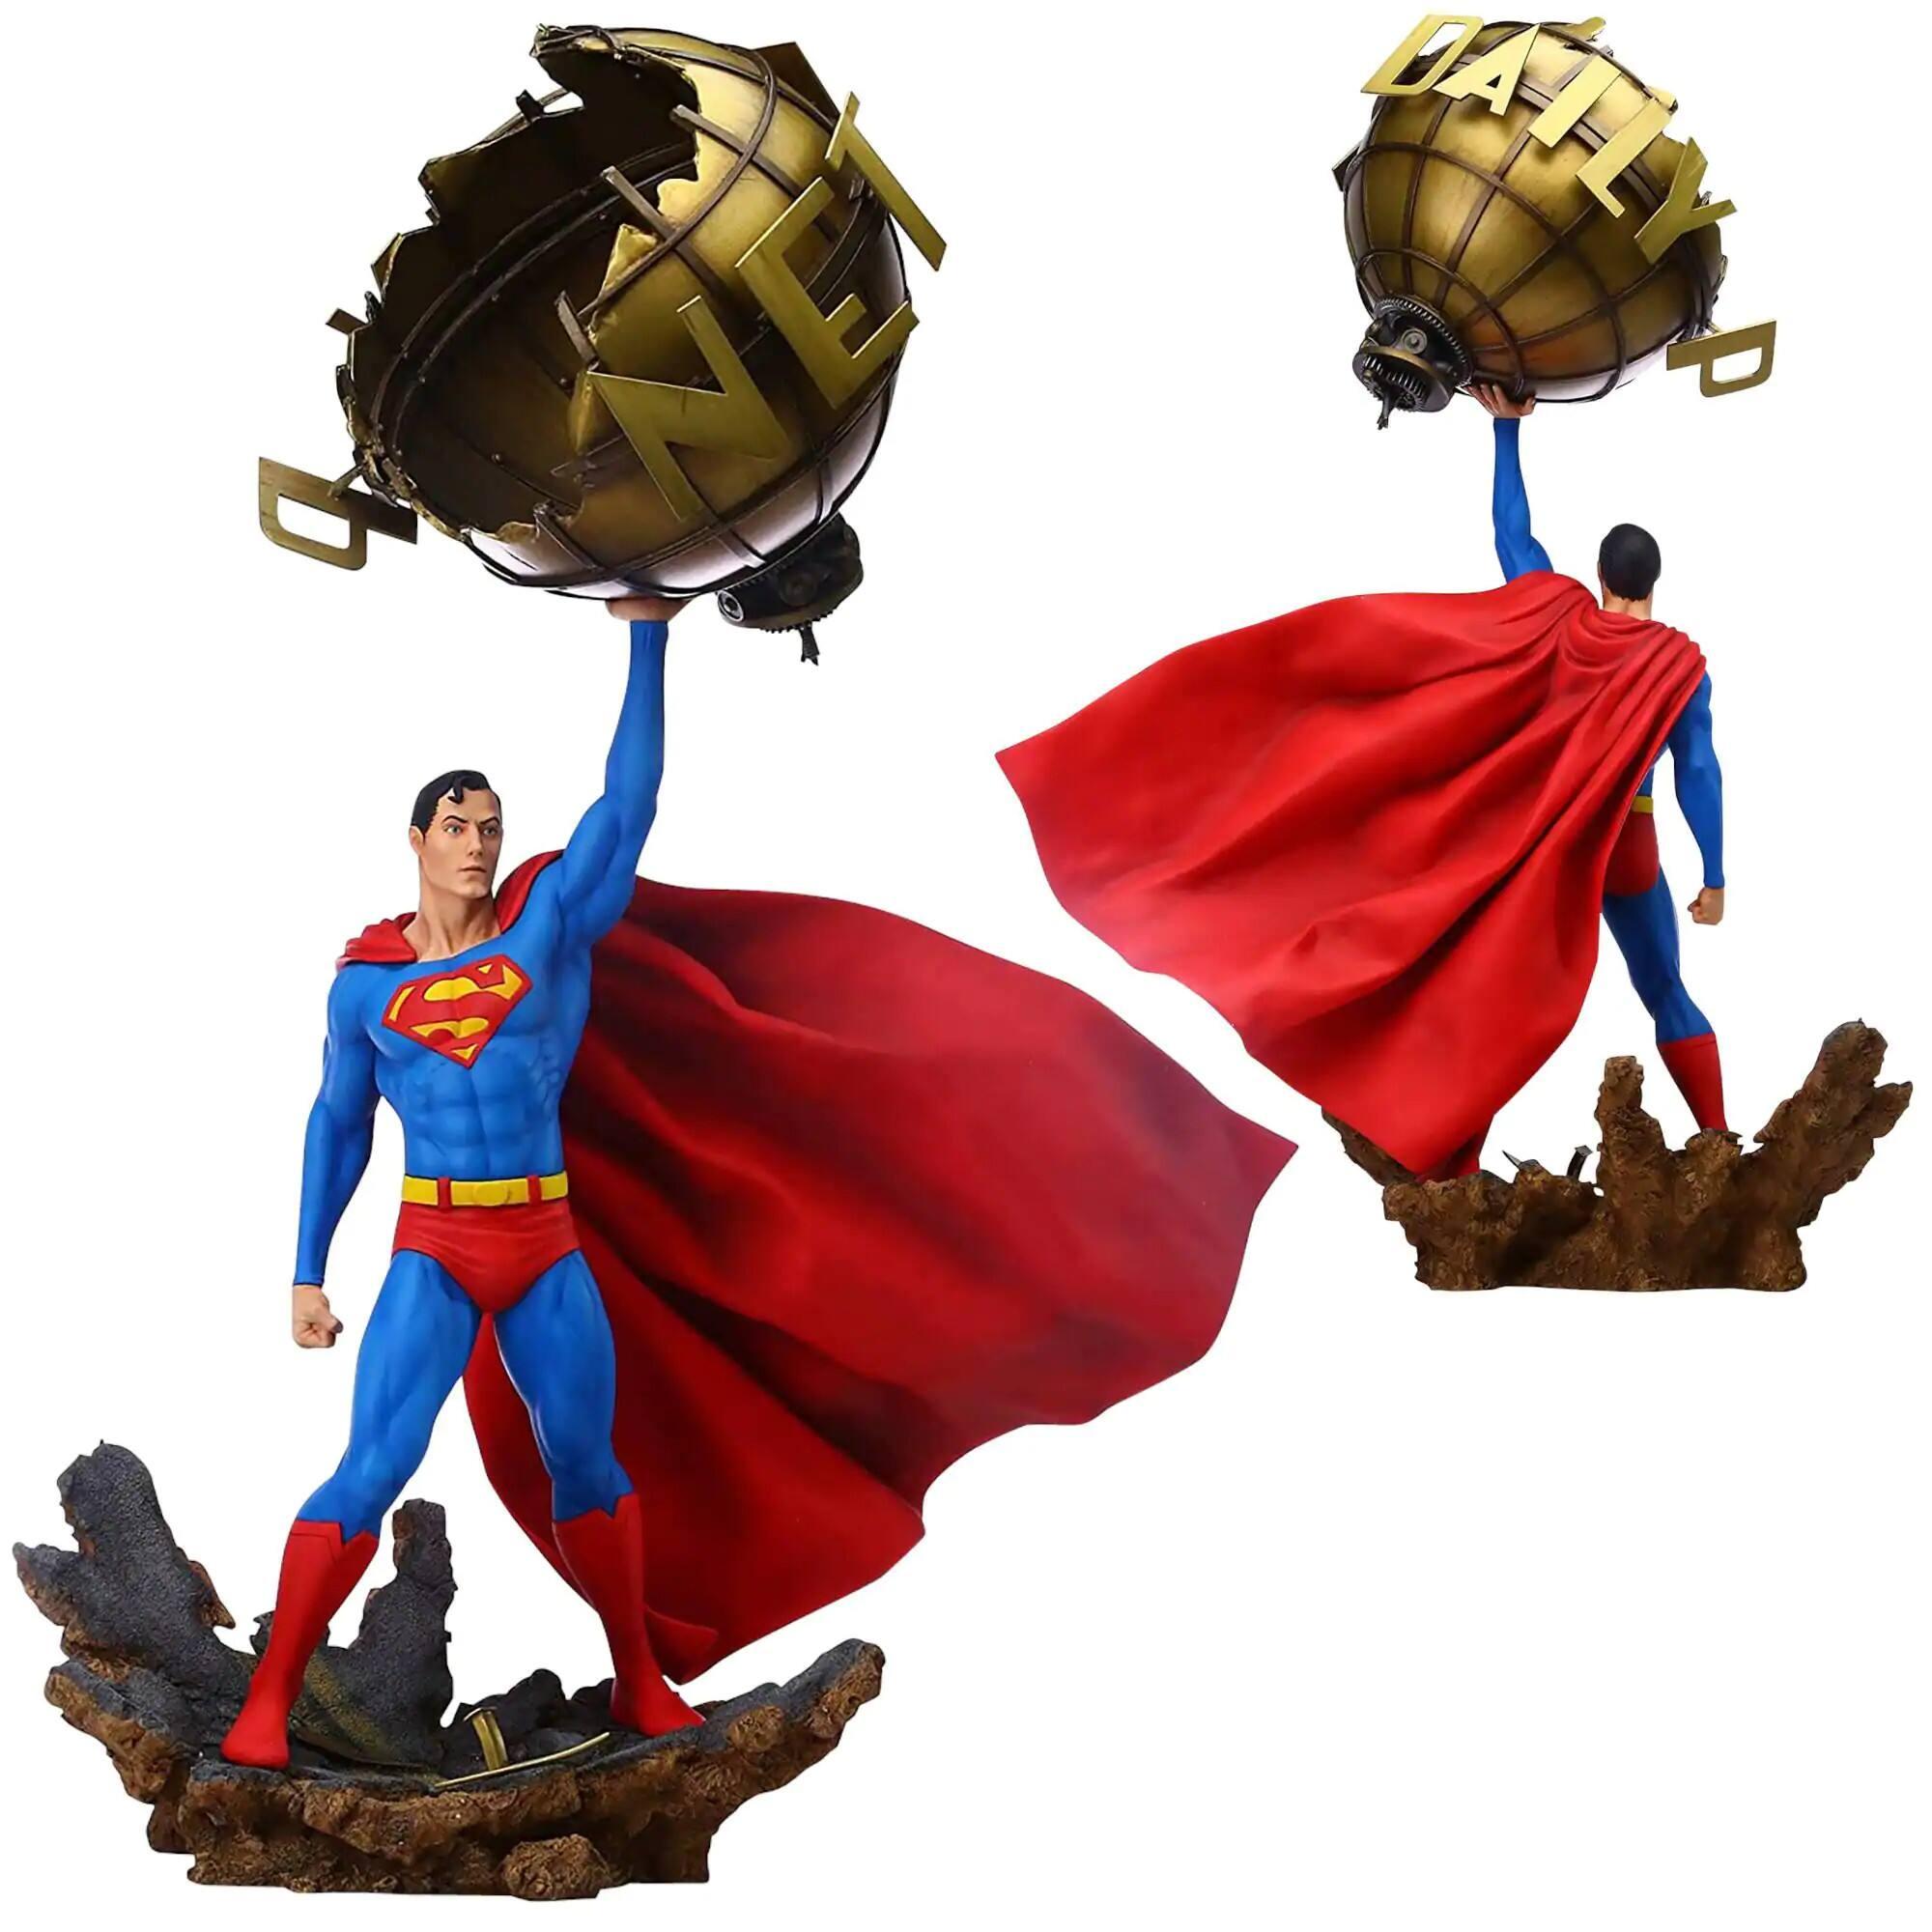 "Enesco Grand Jester Limited Edition 24.4"" DC Superman Statue, 1/6 Scale - $119 shipped"